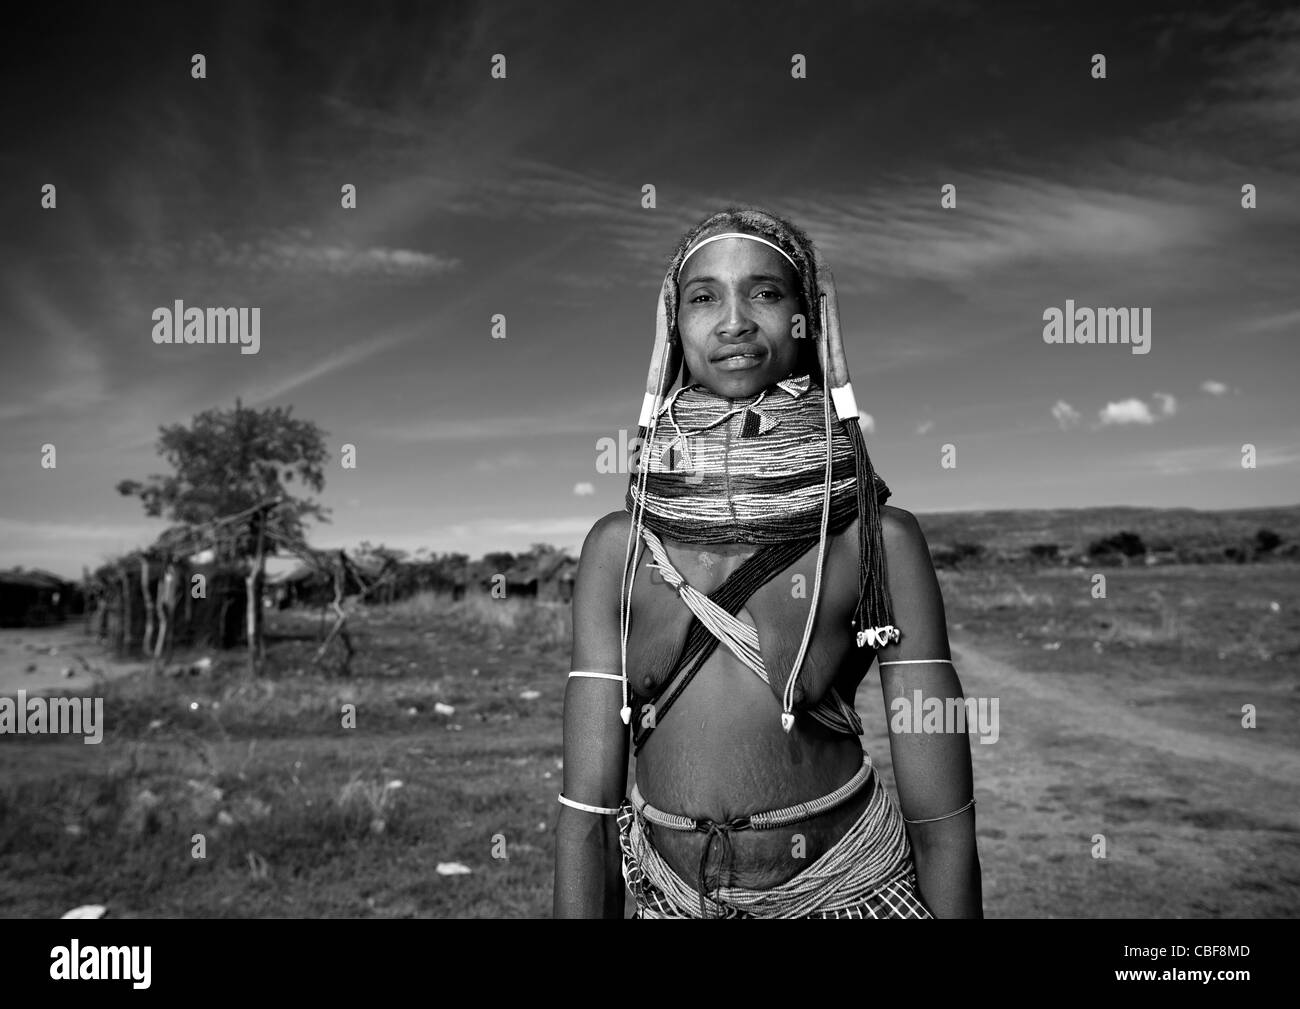 Mwila Woman With Vilanda Necklace, Chibia Area, Angola - Stock Image